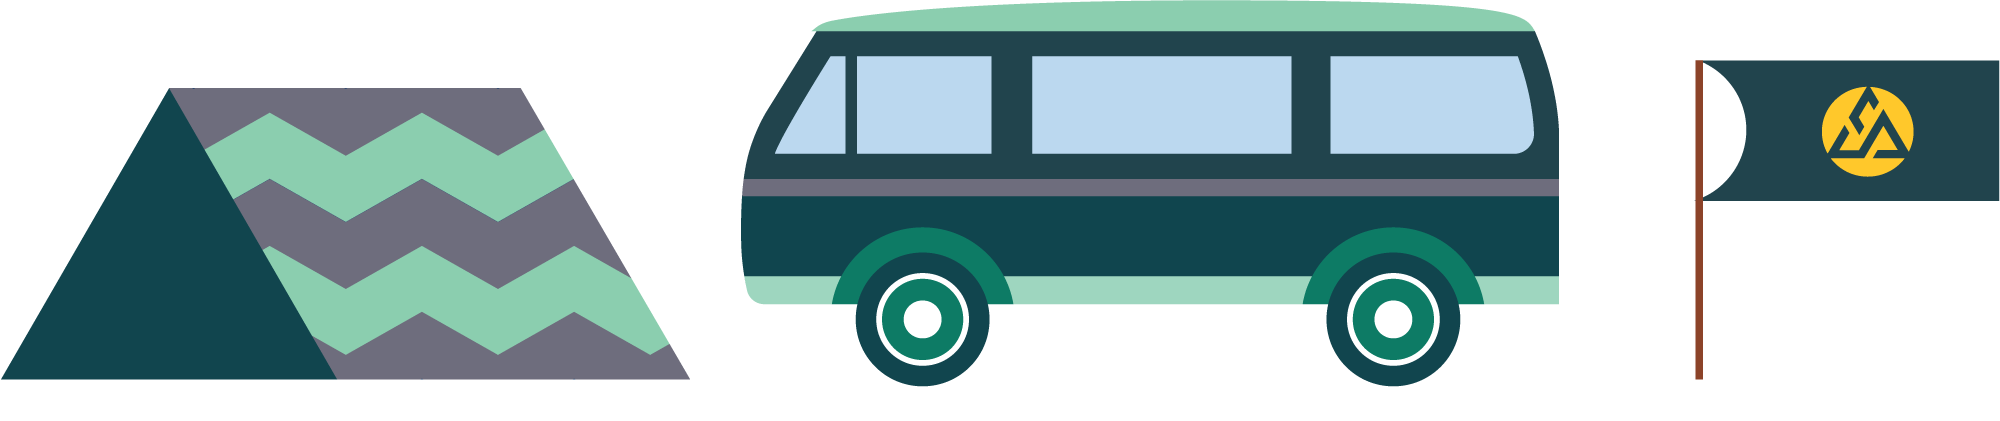 car-camping-web.png